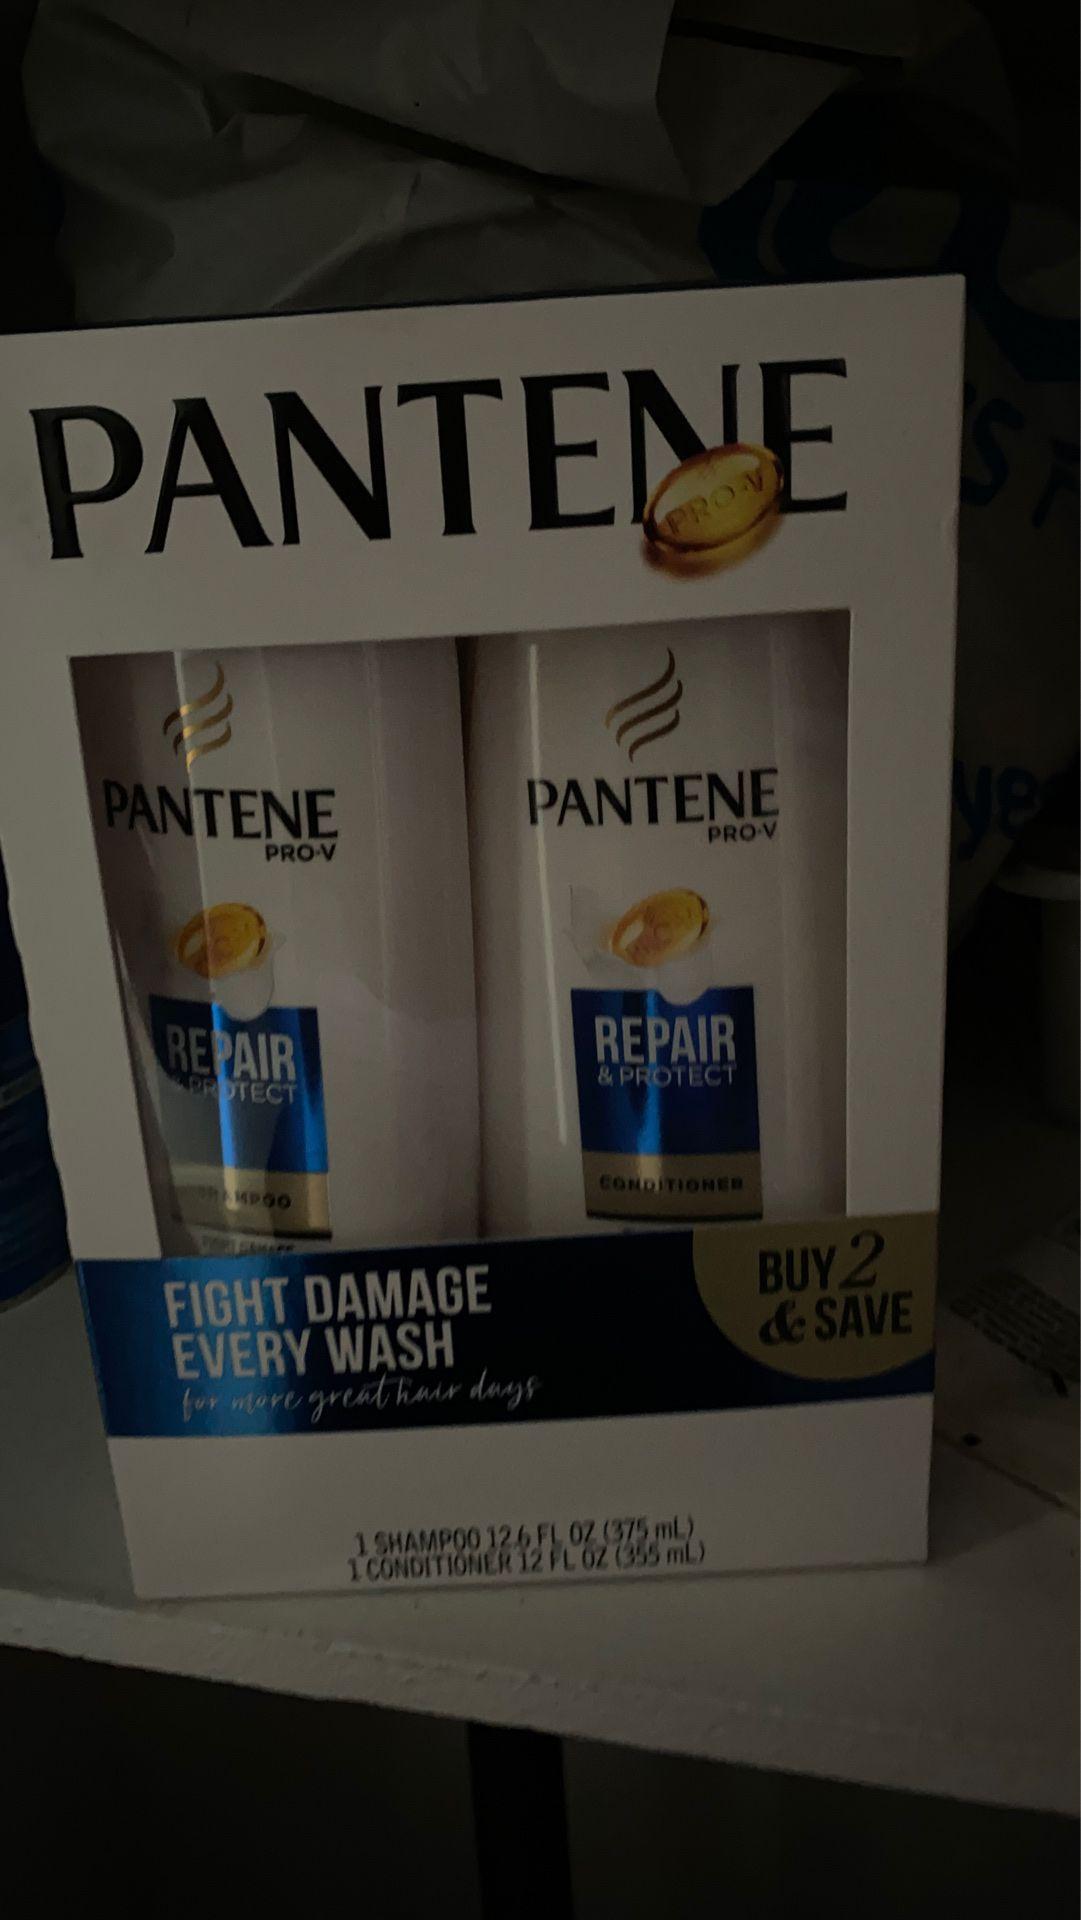 Shampoo and conditioner Pantene